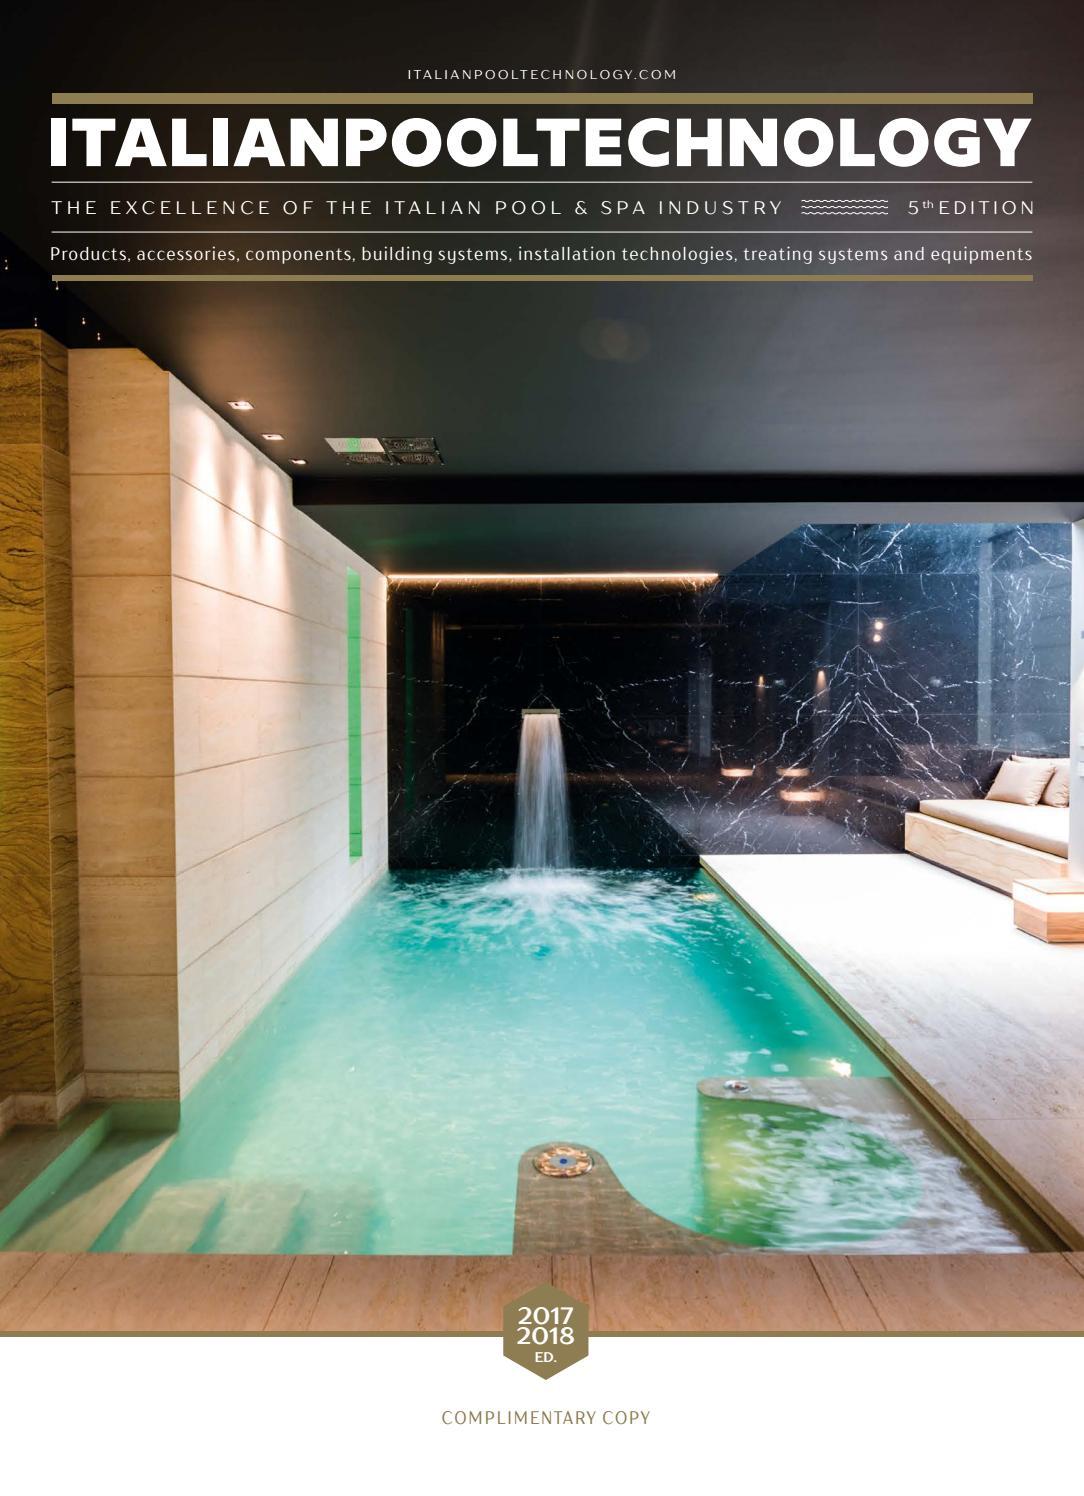 Foto Di Piscine Private italian pool technology 2017/2018 by editrice il campo - issuu